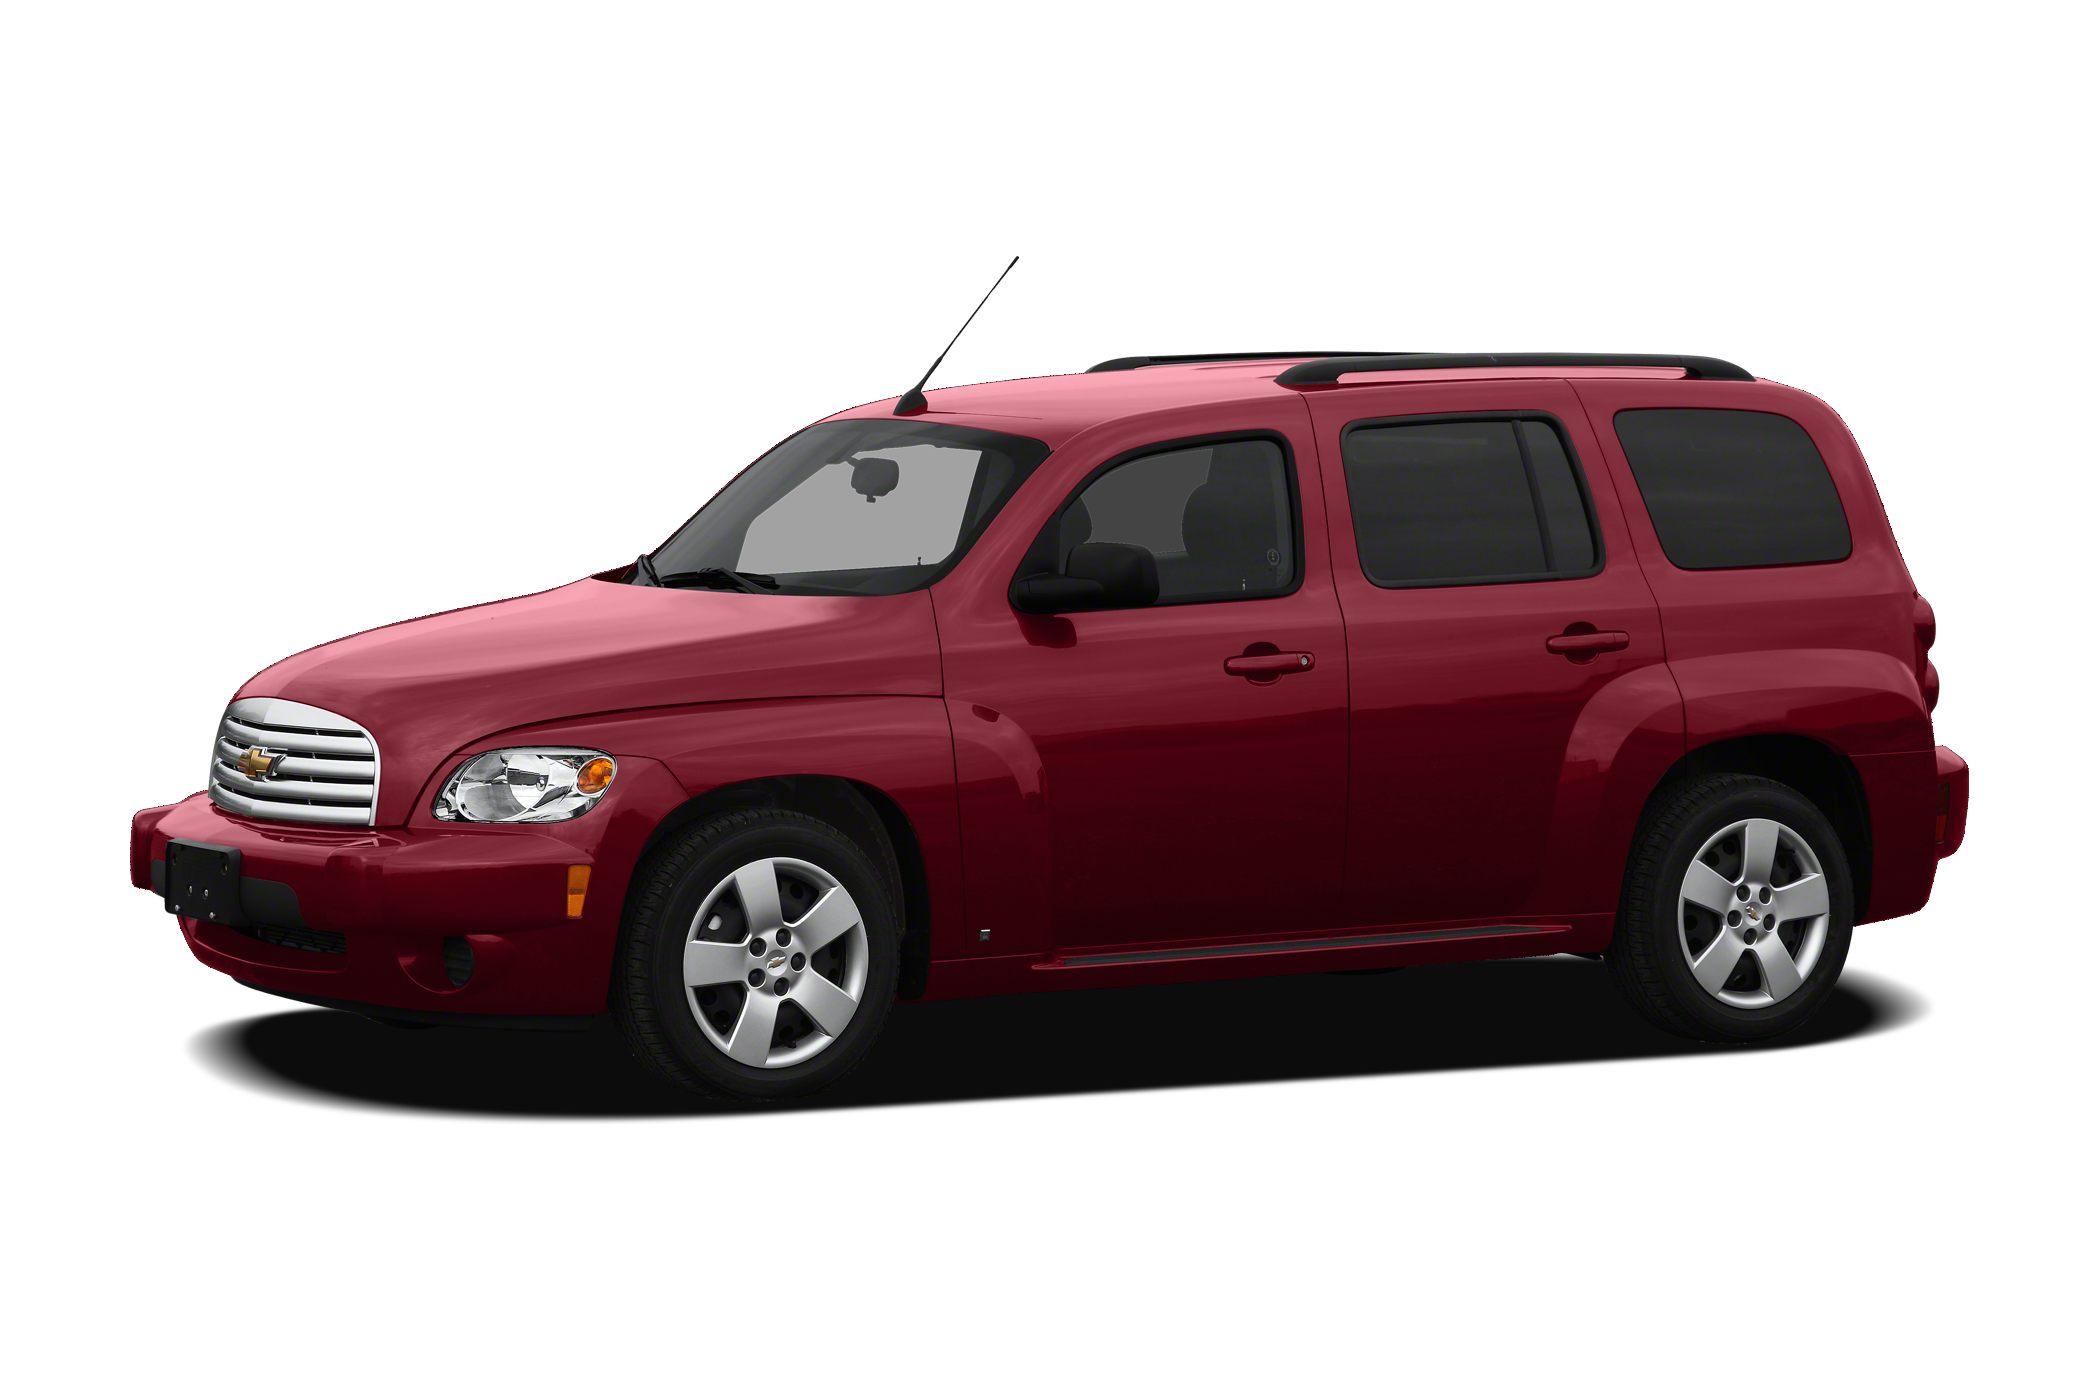 Chevrolet Hhr News Photos And Buying Information Autoblog